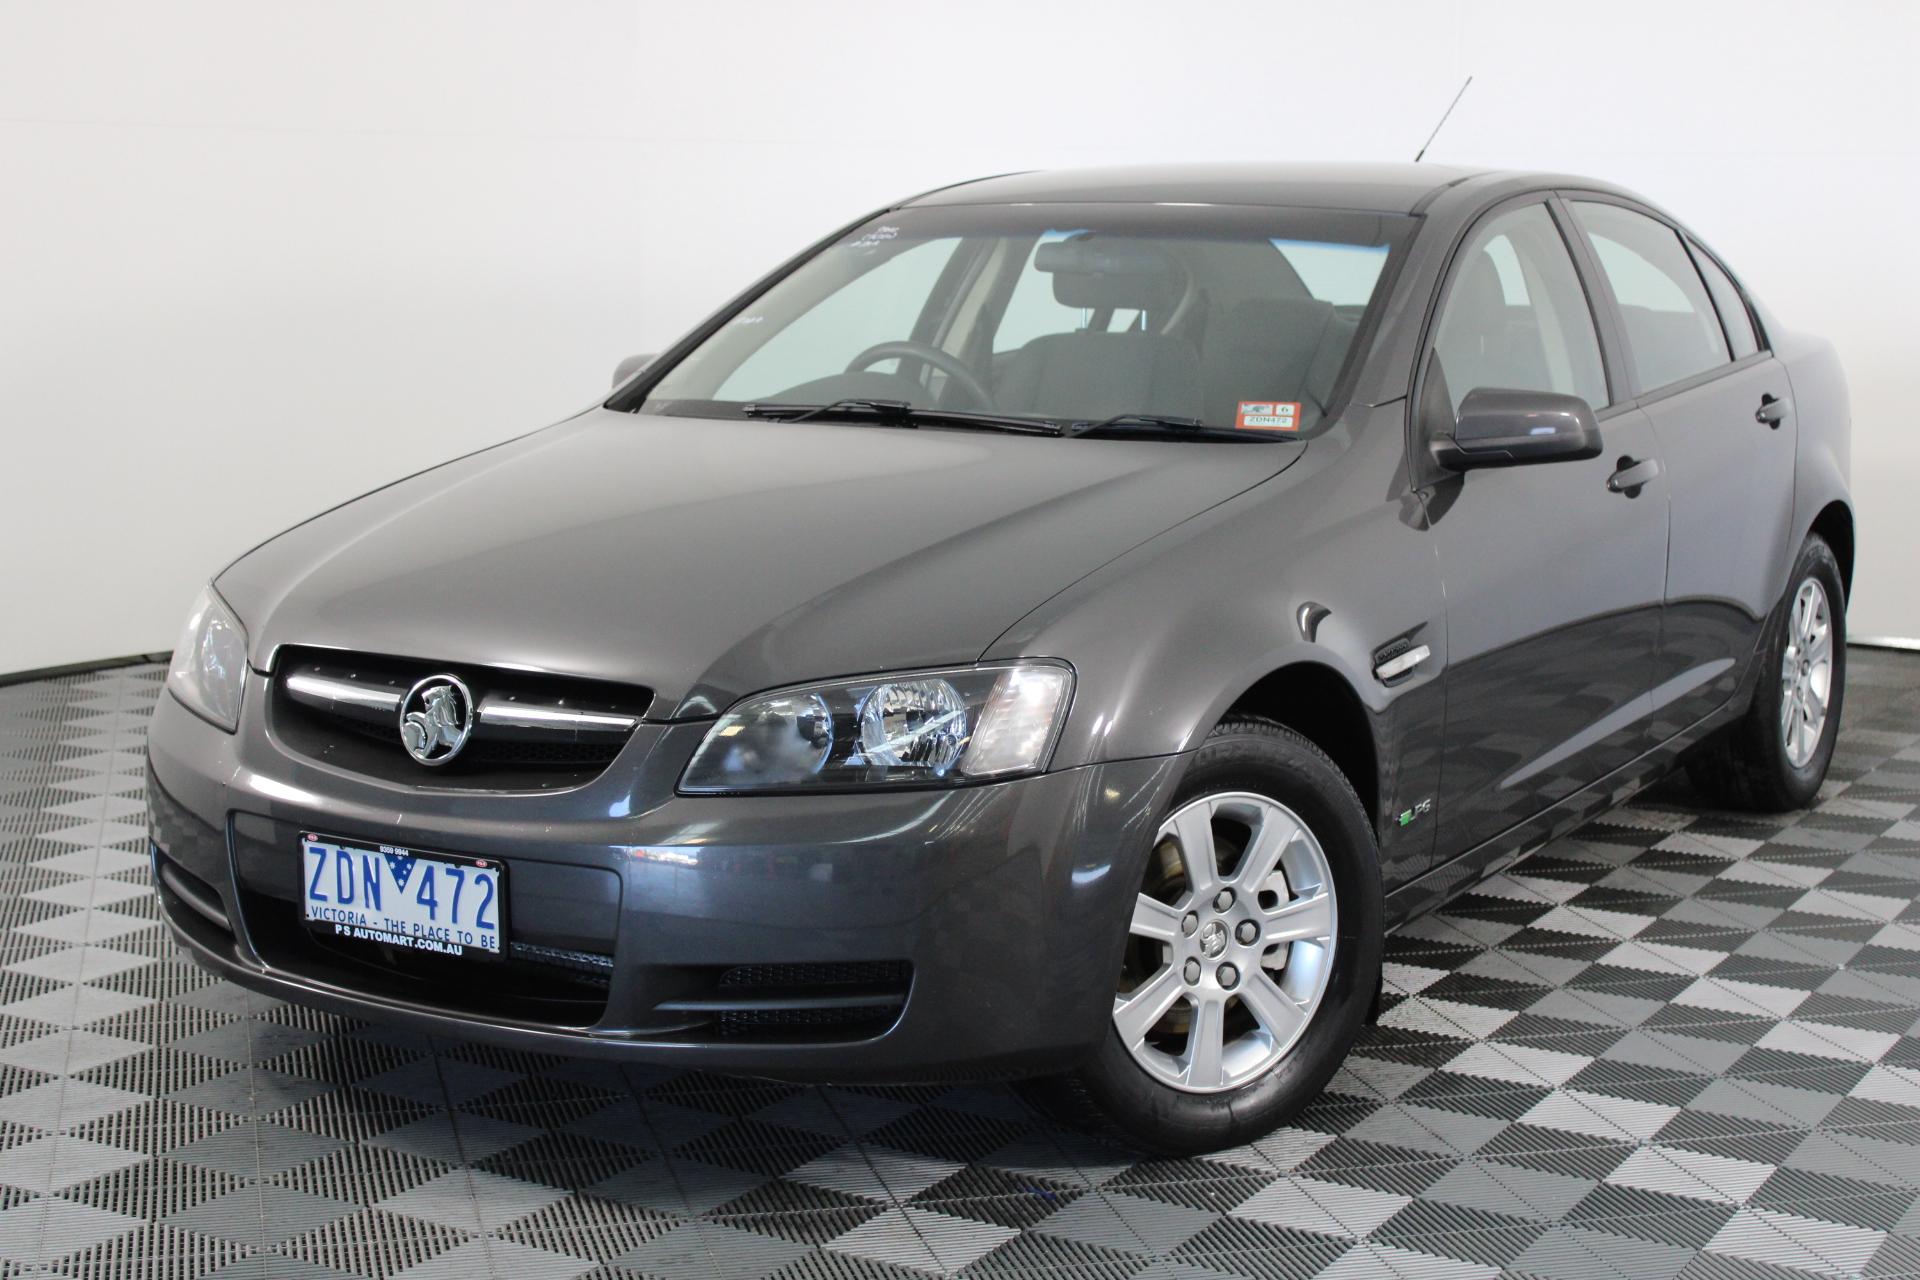 2010 Holden Commodore Omega VE LPG Automatic Sedan